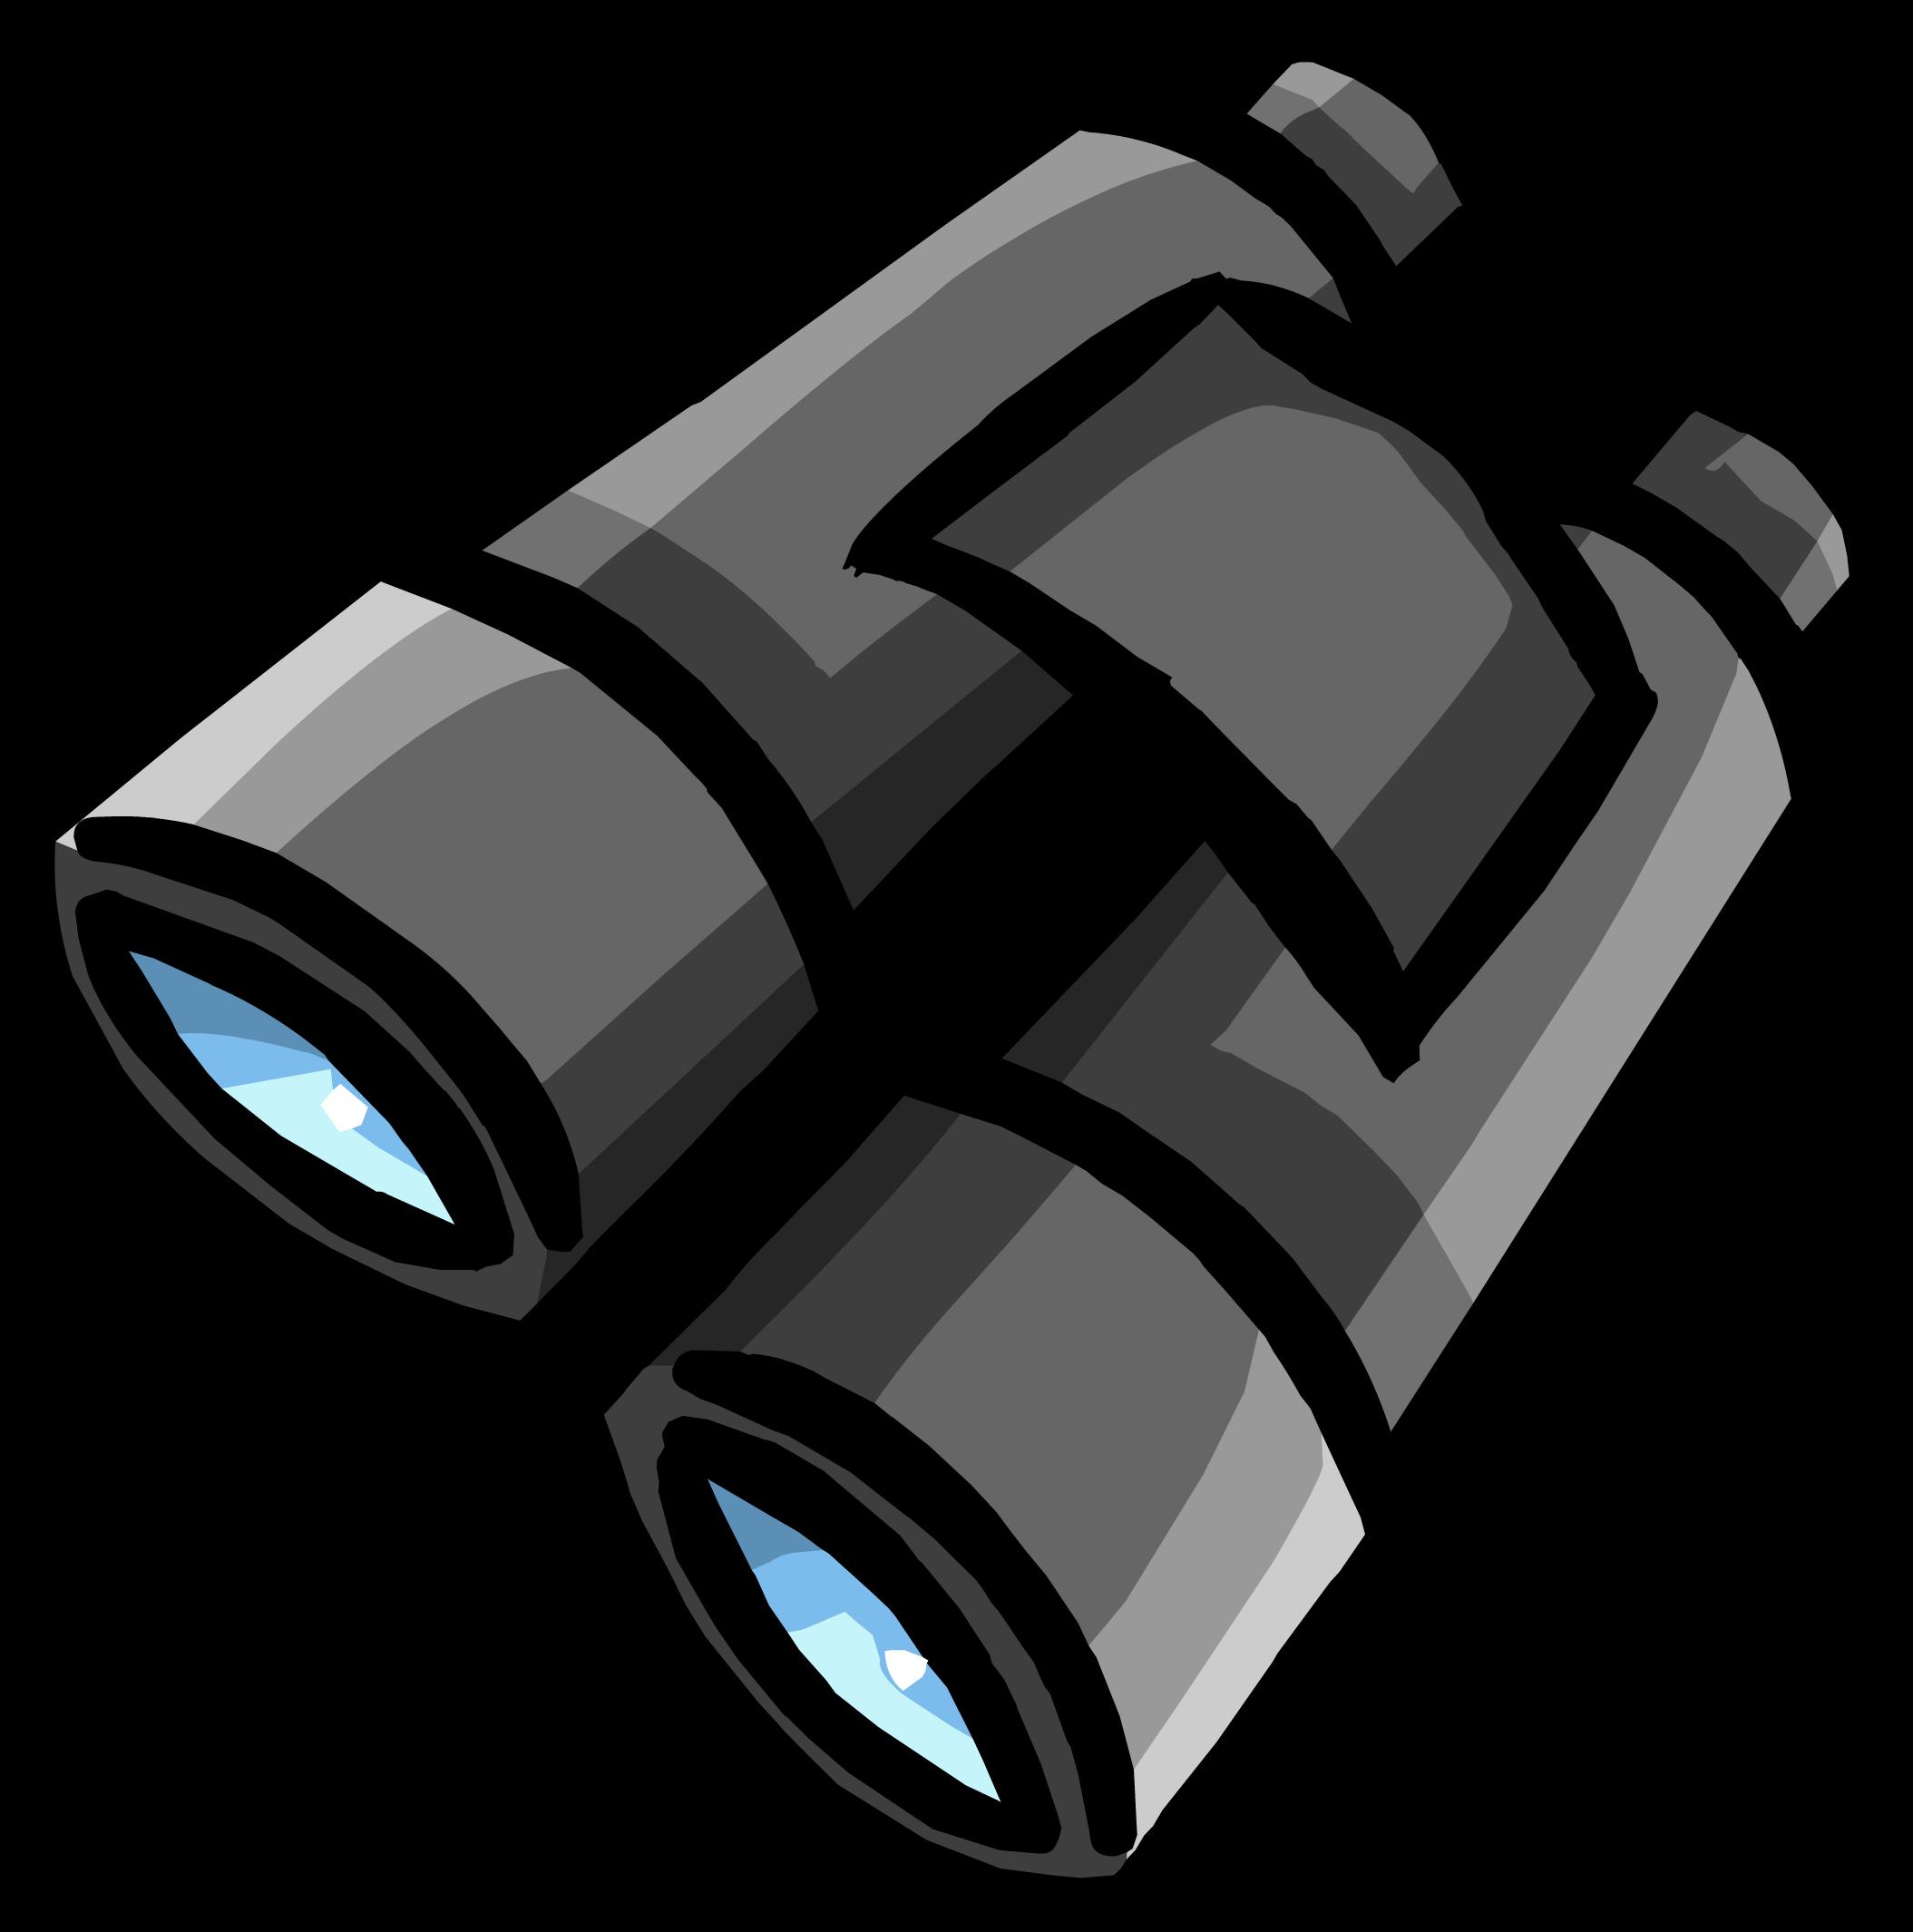 Binocular clipart. Free binoculars cliparts download